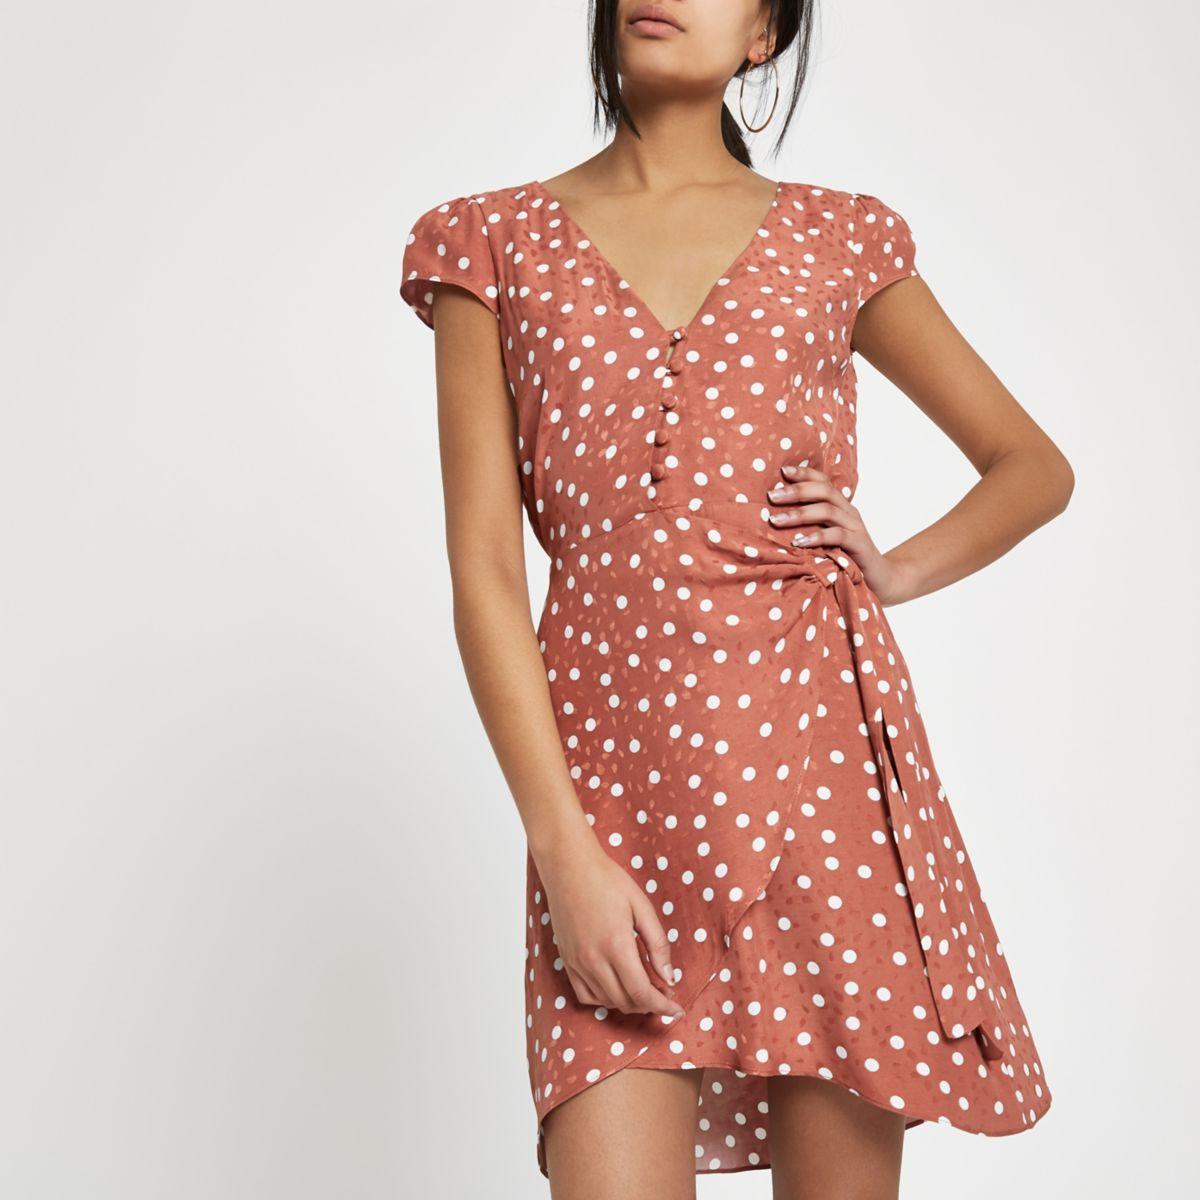 Brown polka dot cap sleeve wrap dress